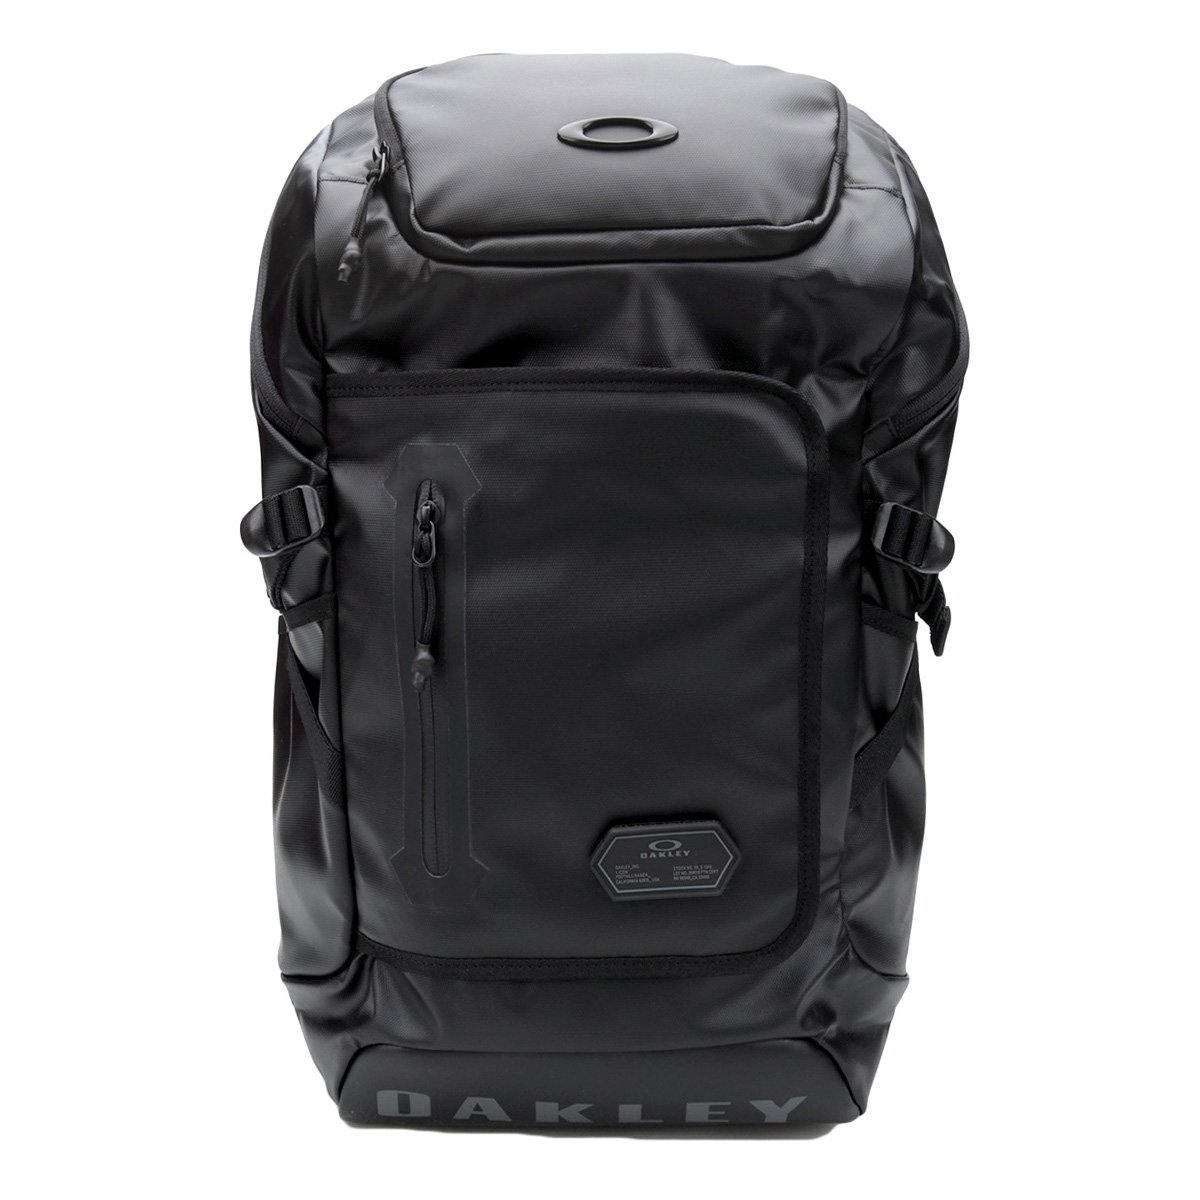 Mochila Oakley Mod Training Backpack - Compre Agora  164569f7de9